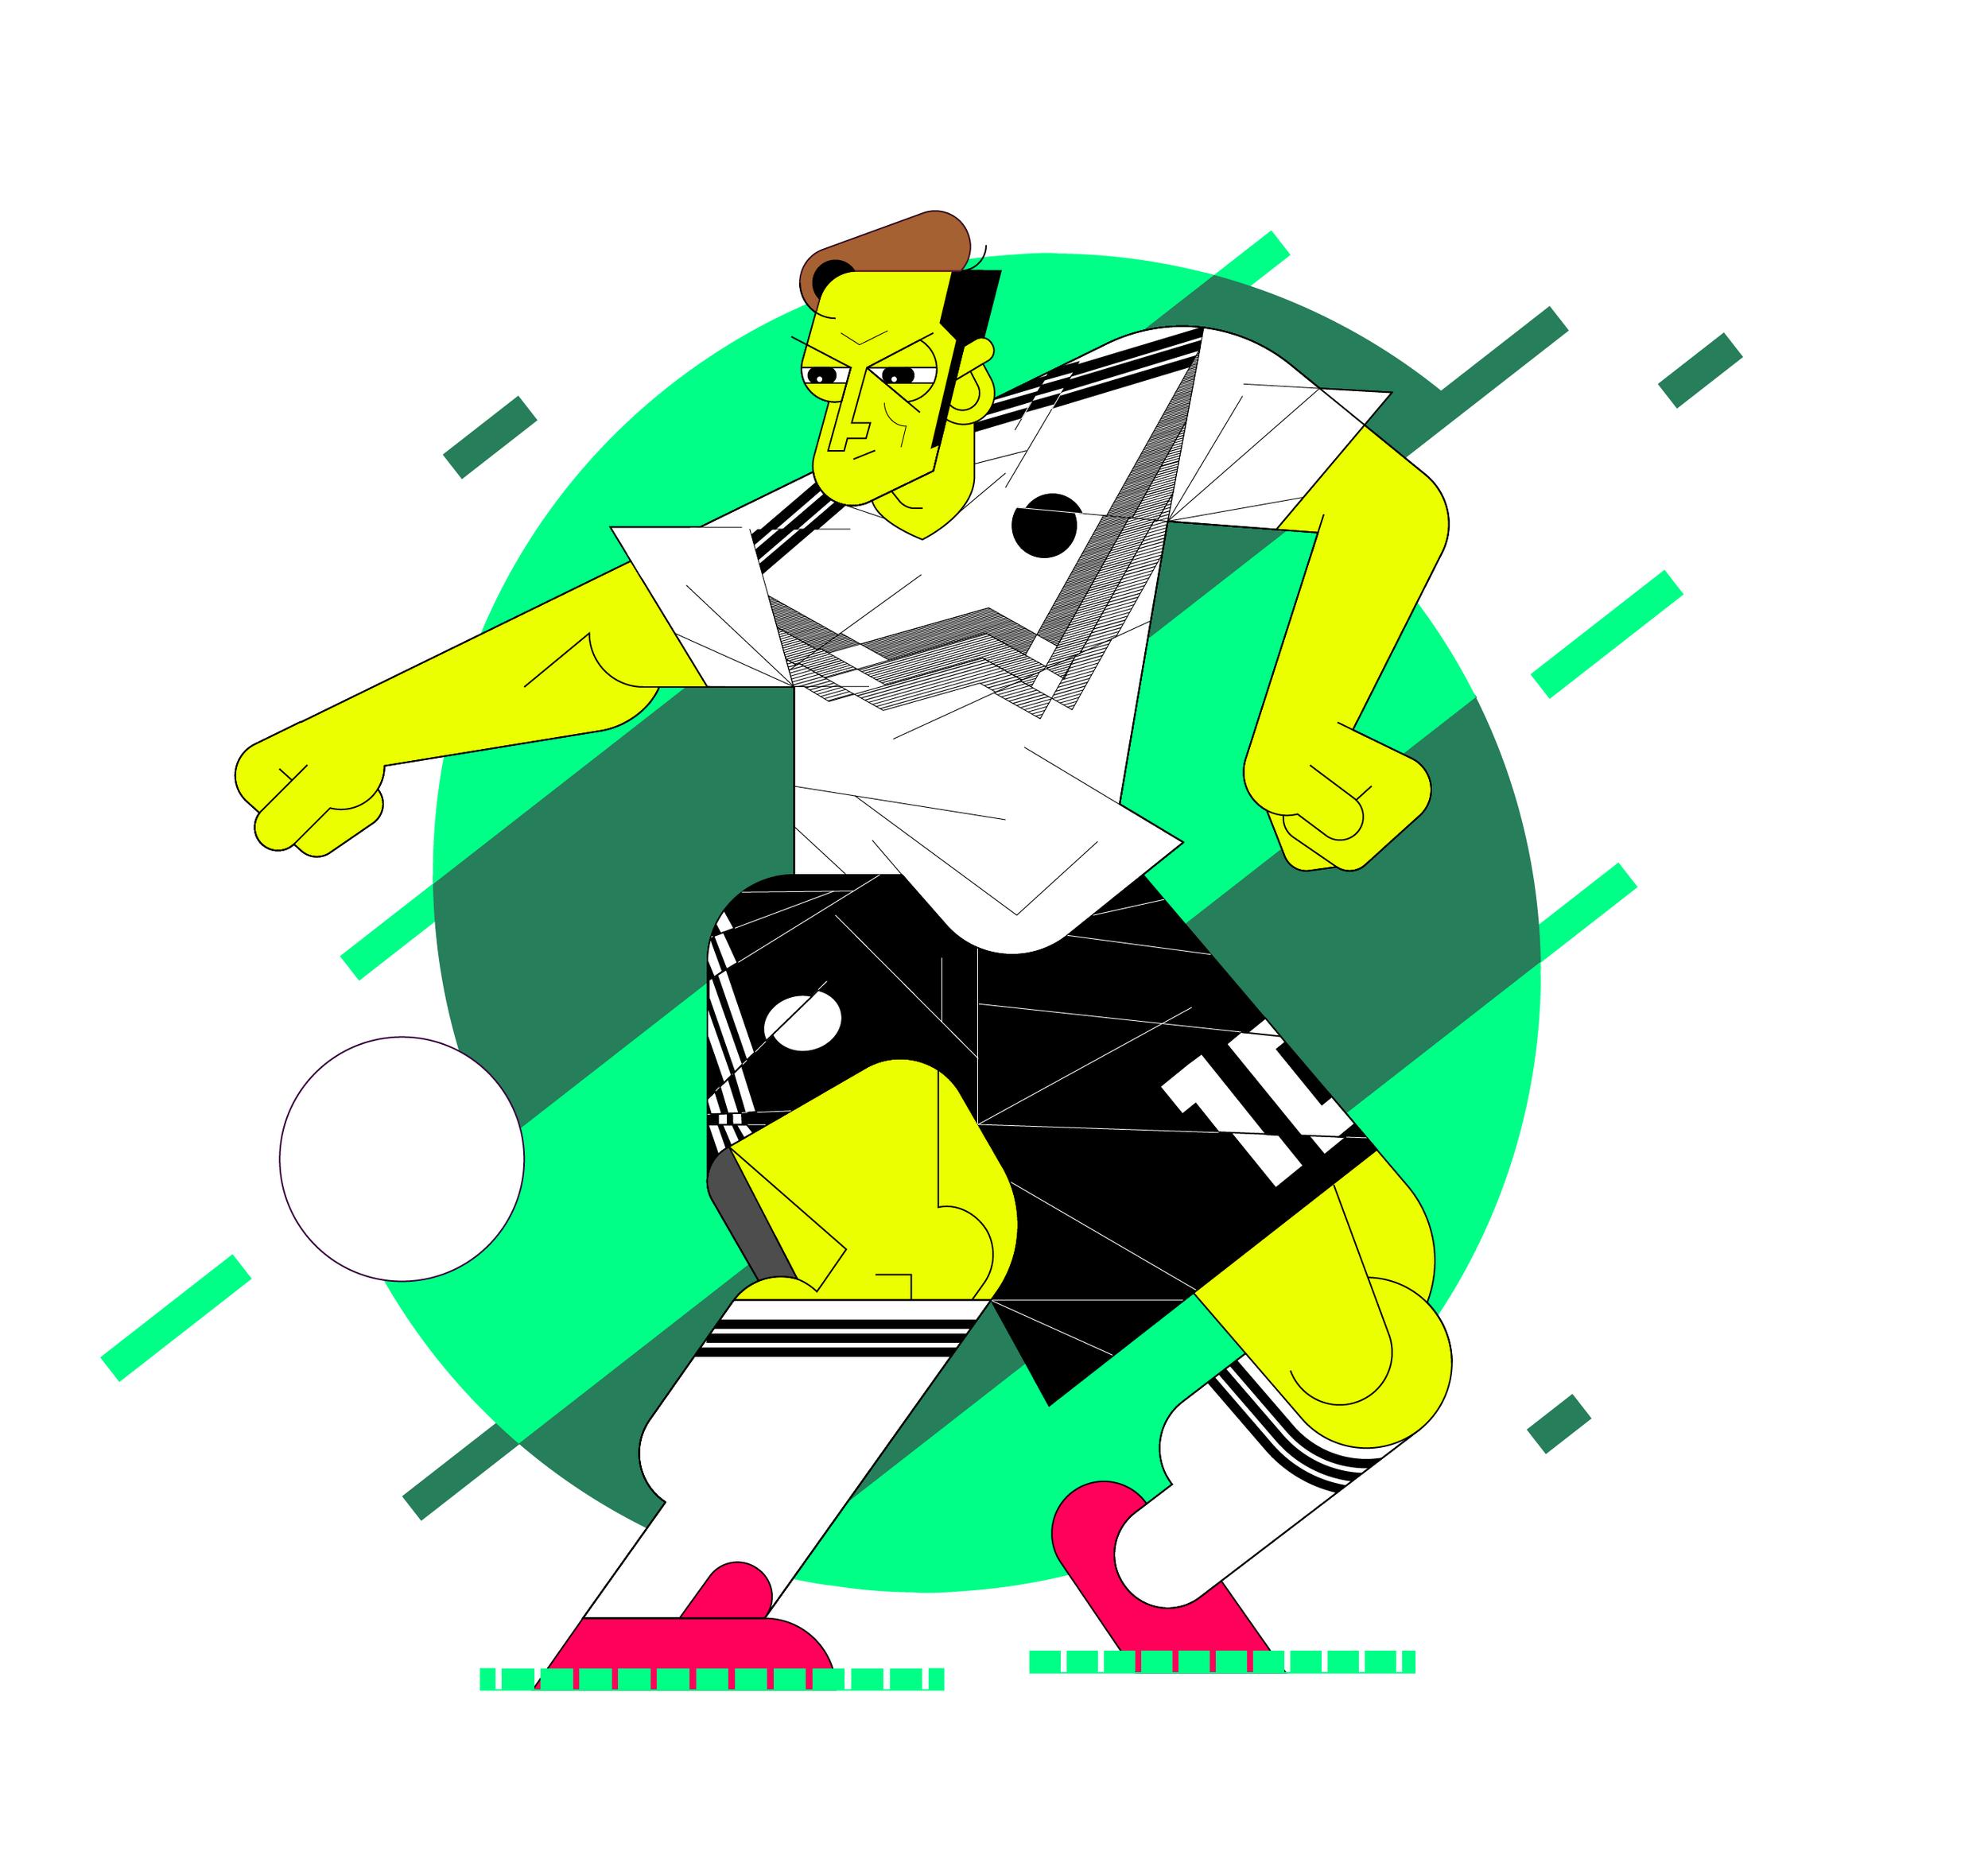 Football Players_Mesut Özil studies_Germany final.png